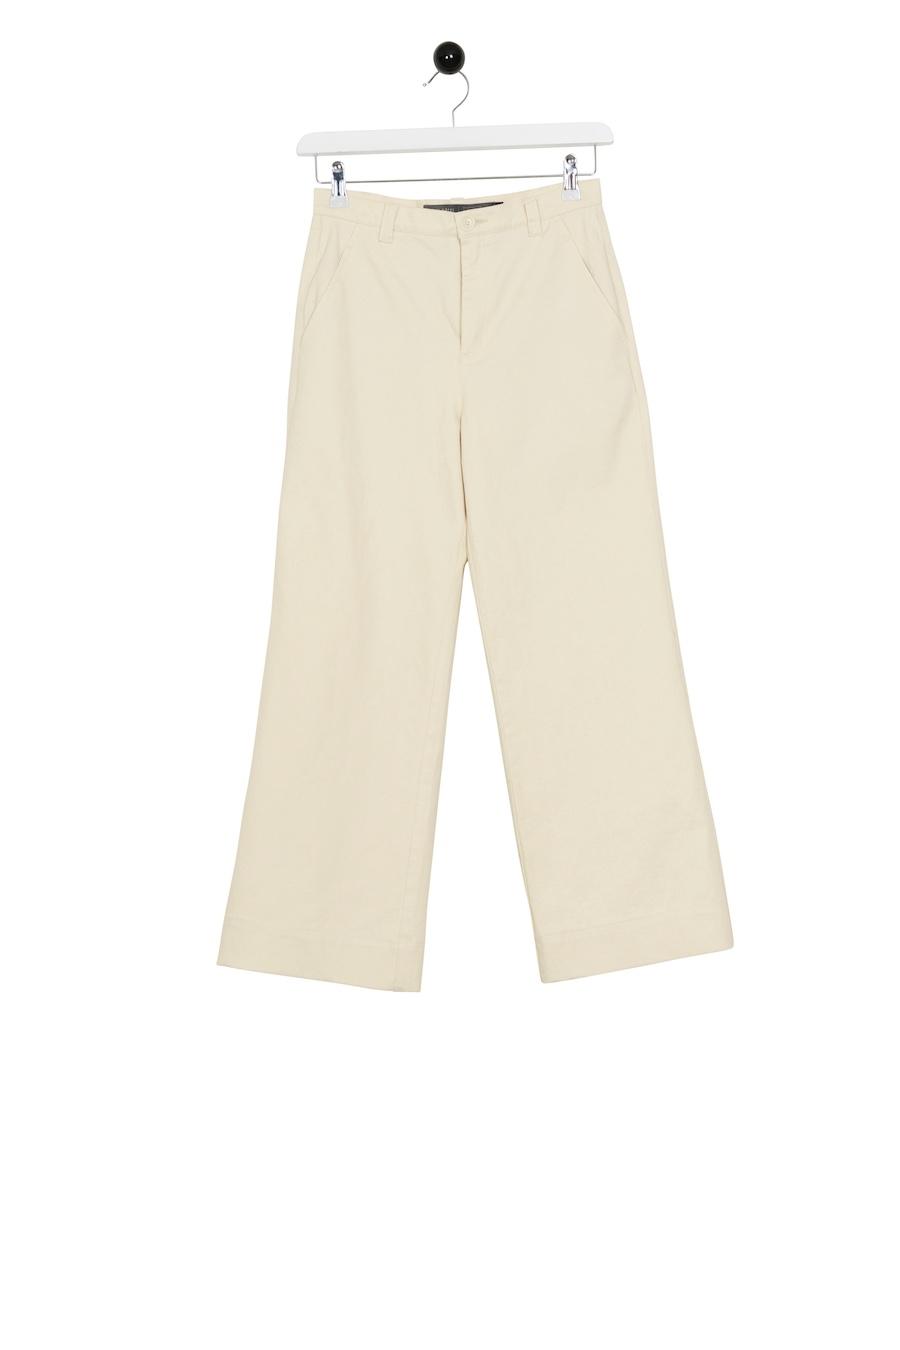 Lipizzaner Trousers W